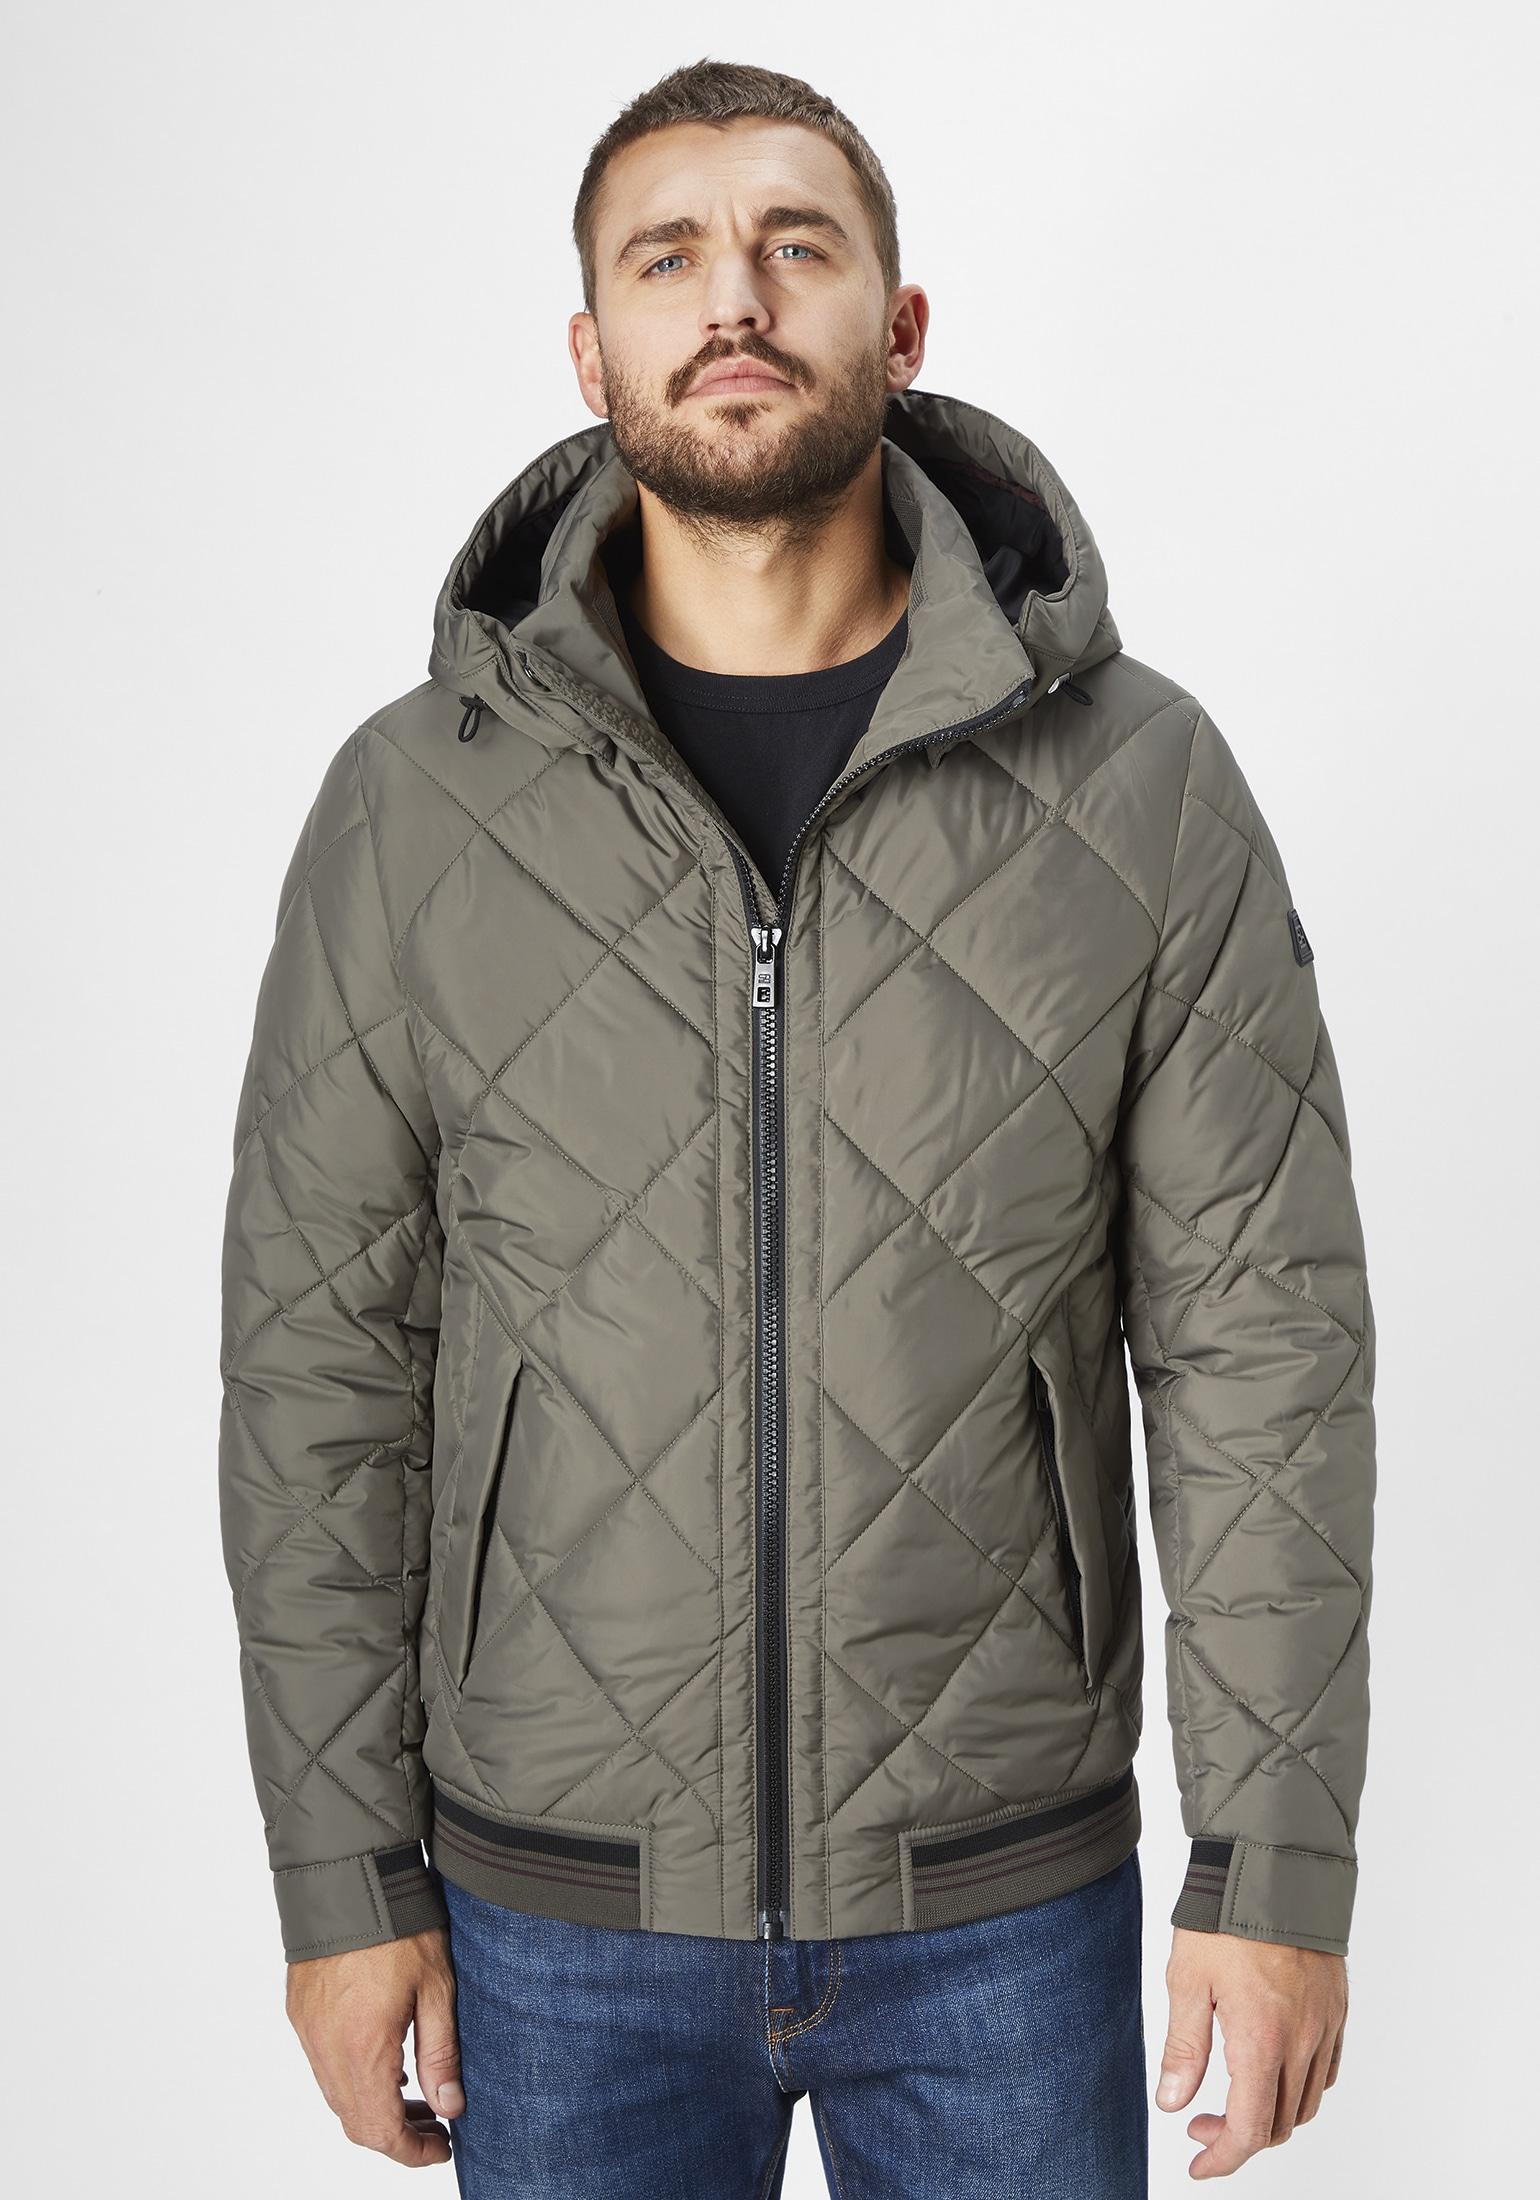 s4 jackets -  Winterjacke Highland, modern